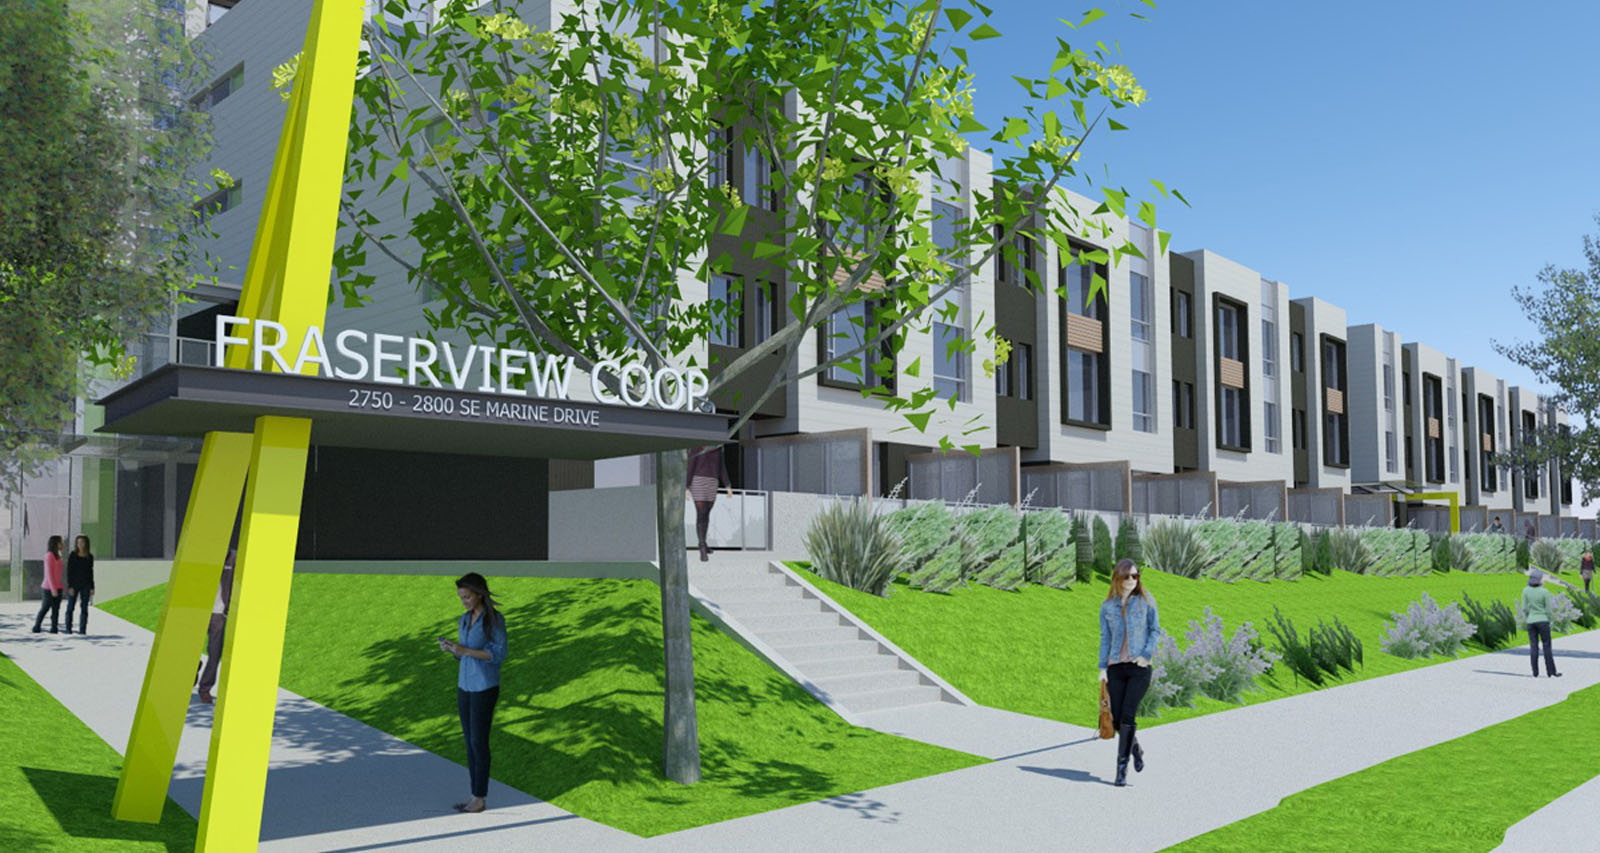 Image: Vancouver Community Land Trust Foundation